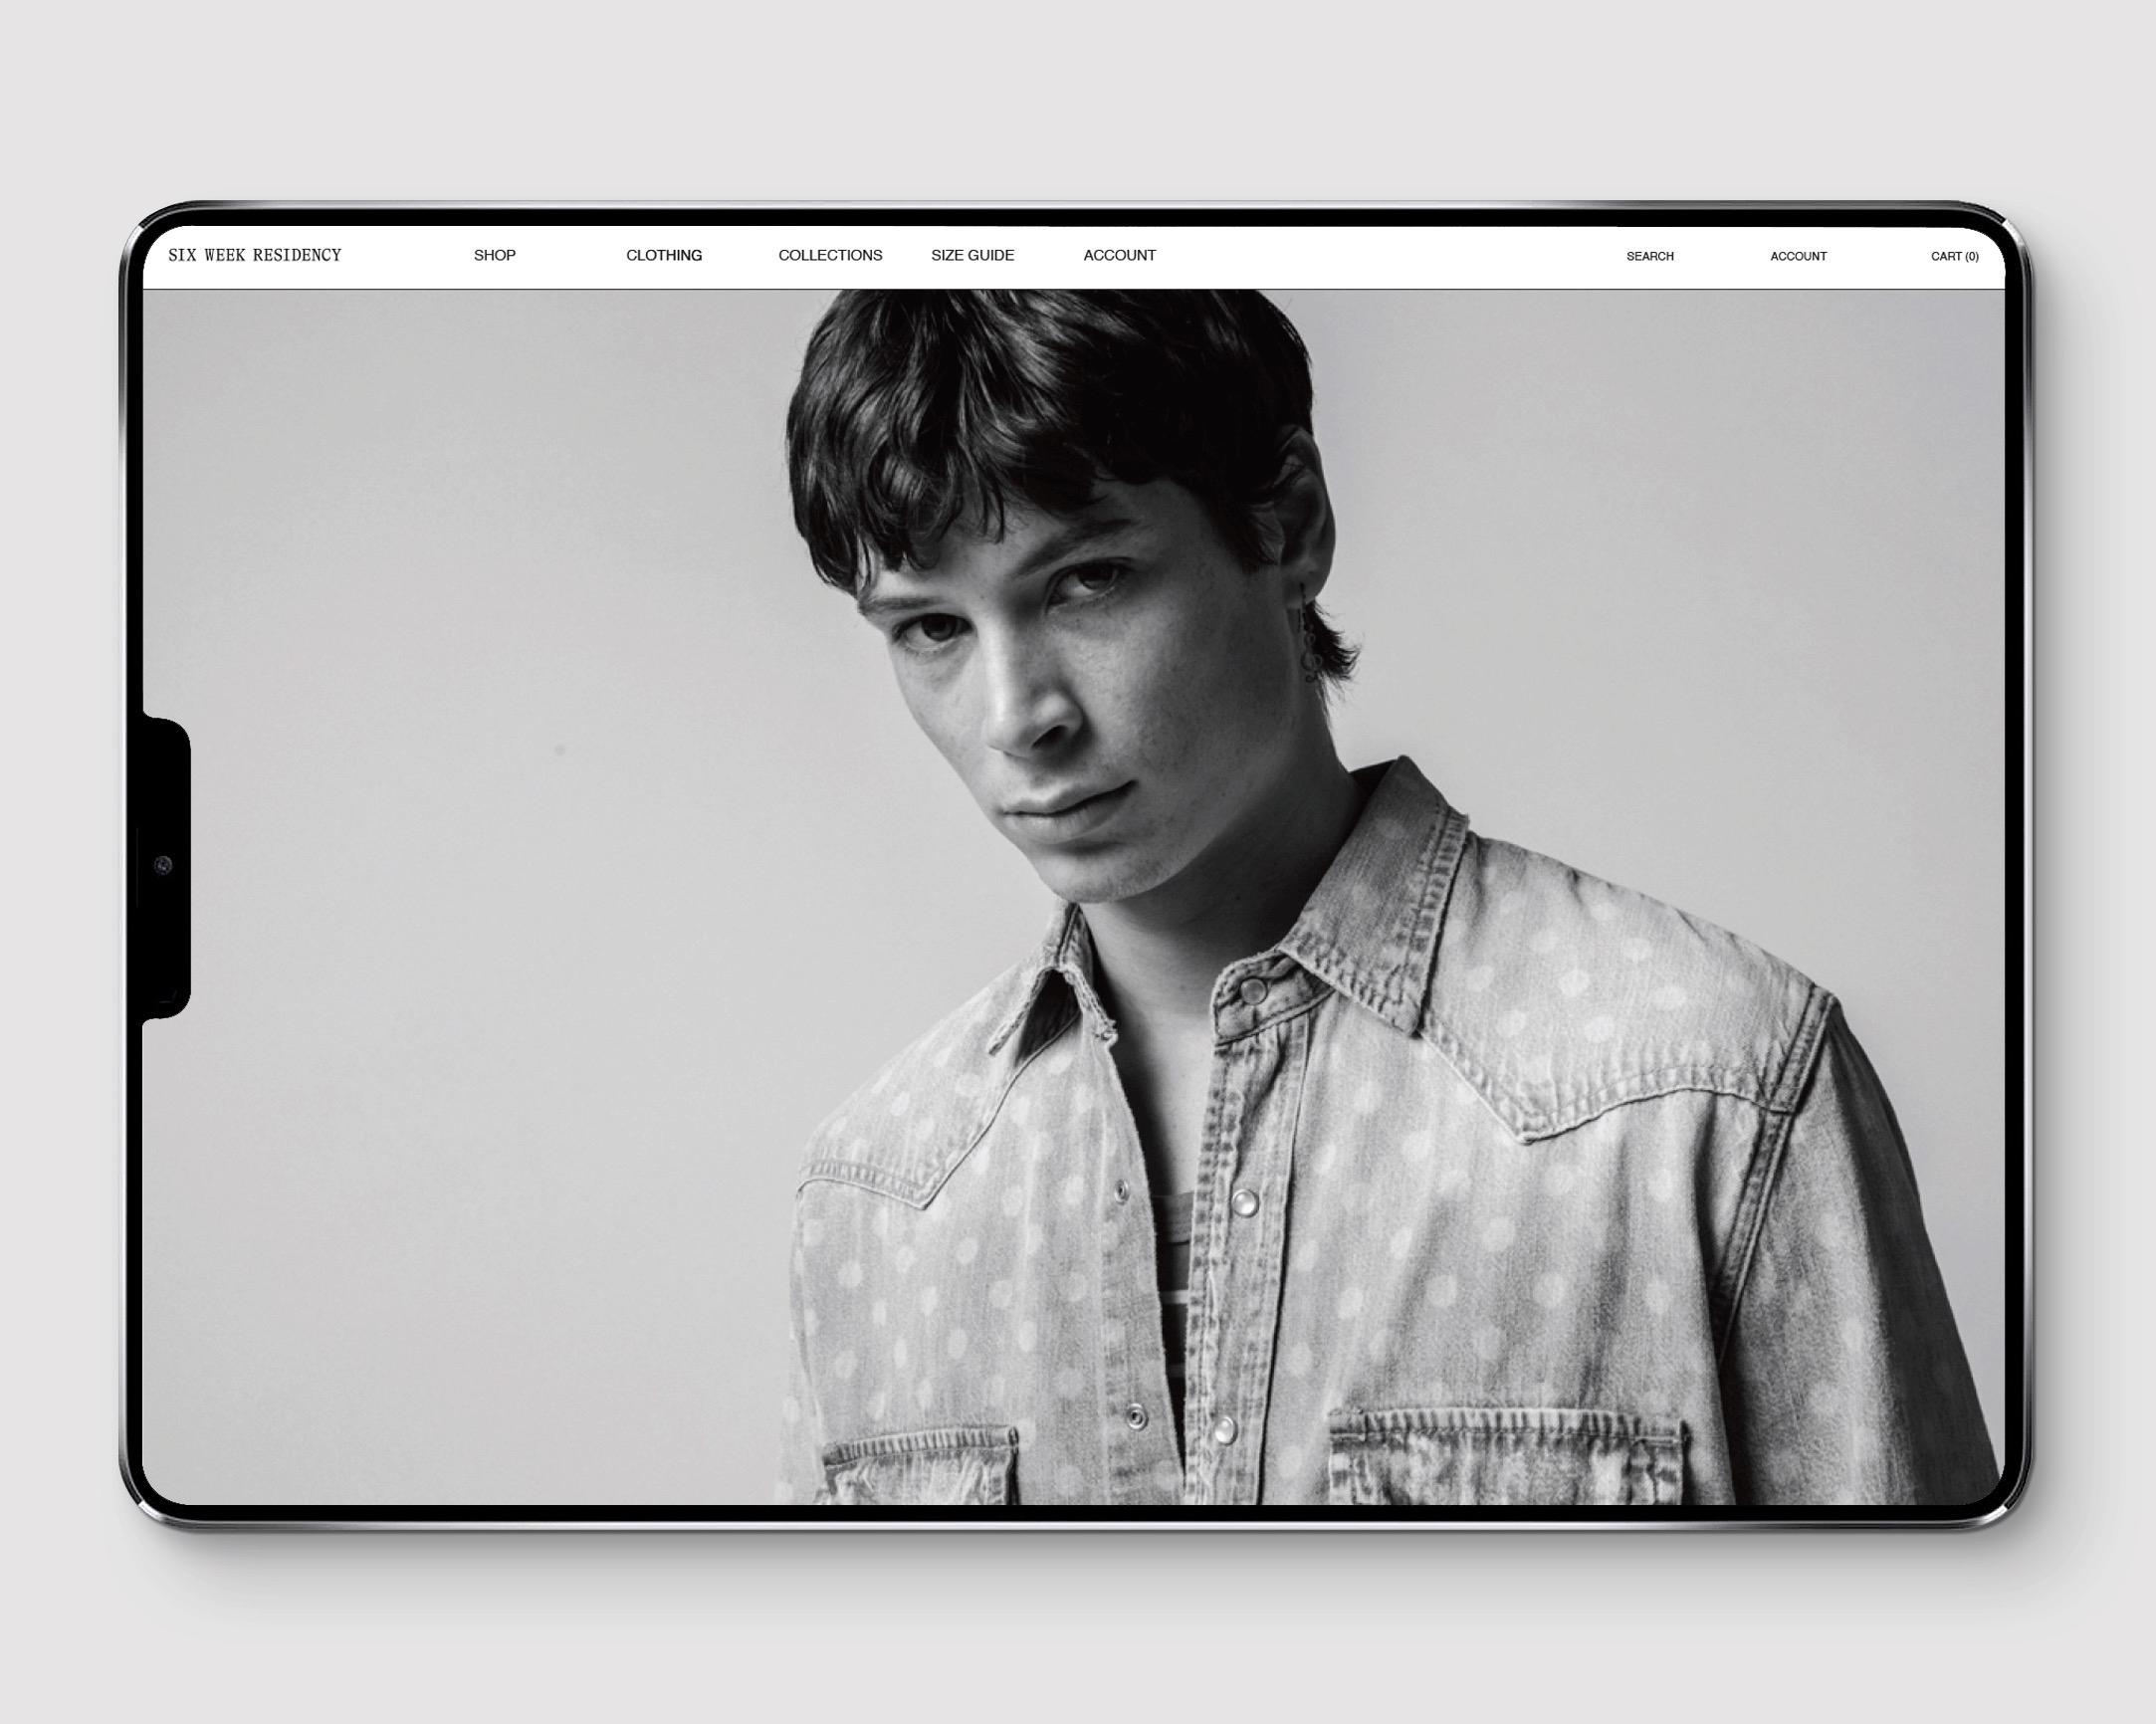 Six Week Residency Web Design on Shopify Platform